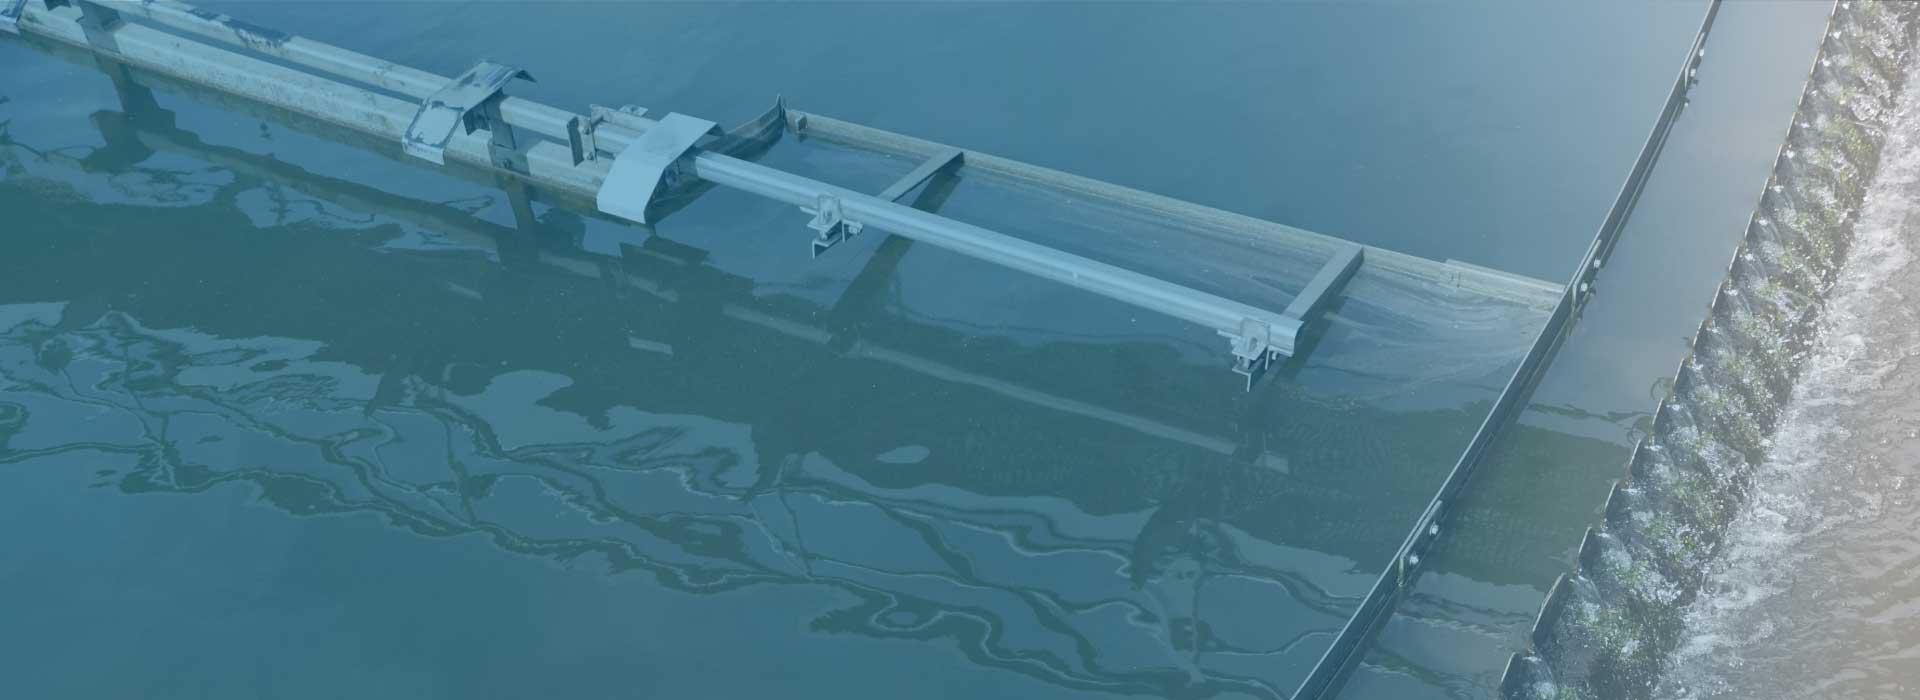 Machine that treats wastewater